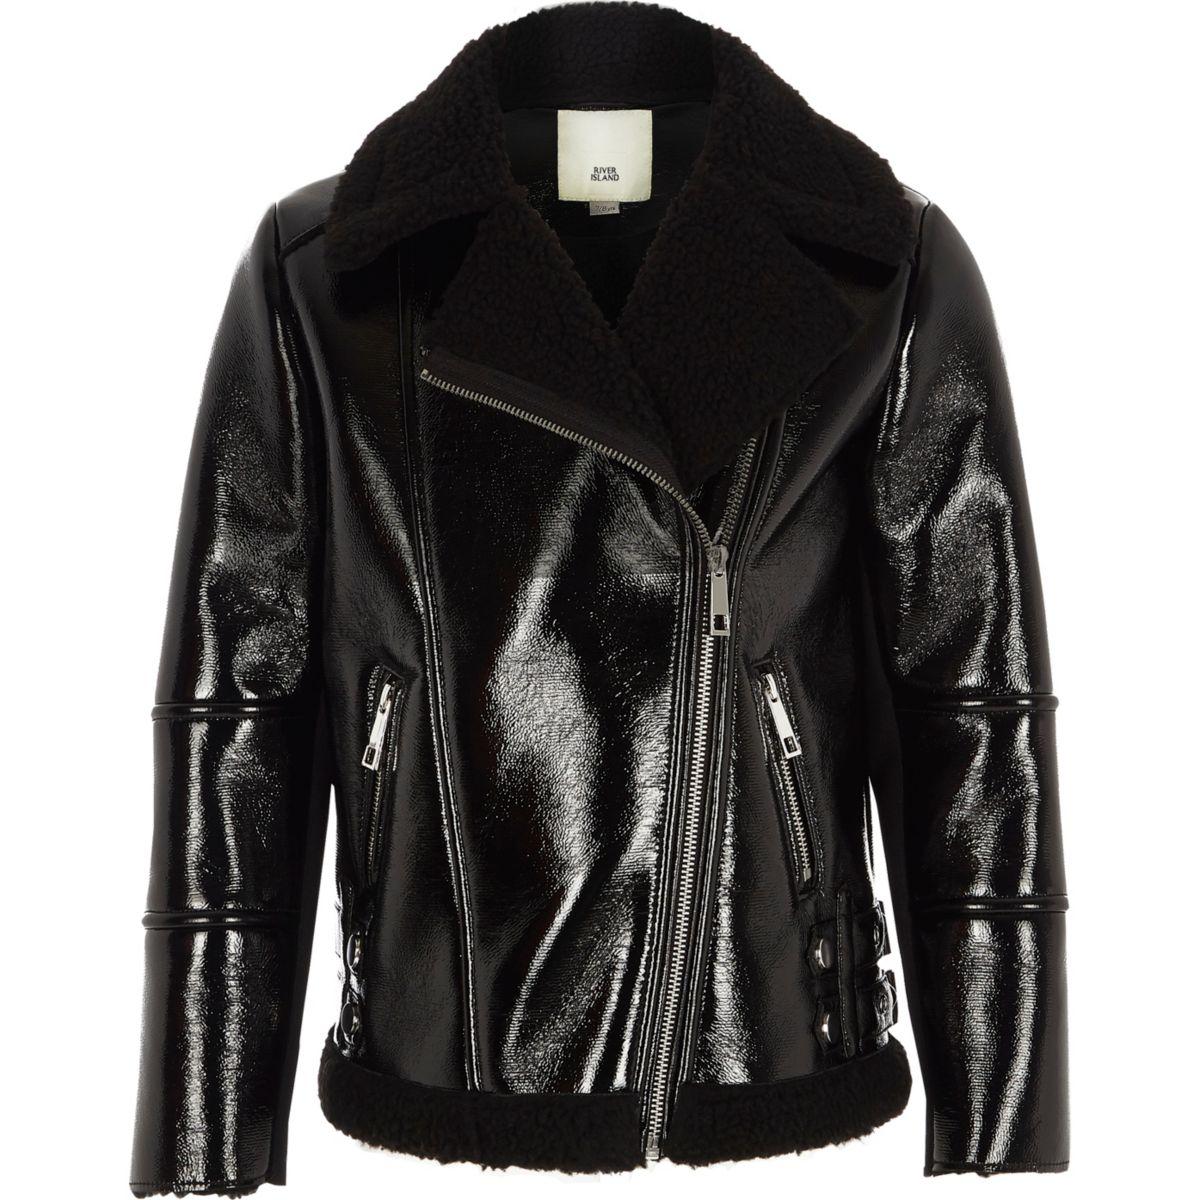 Girls black vinyl fleece lined aviator jacket